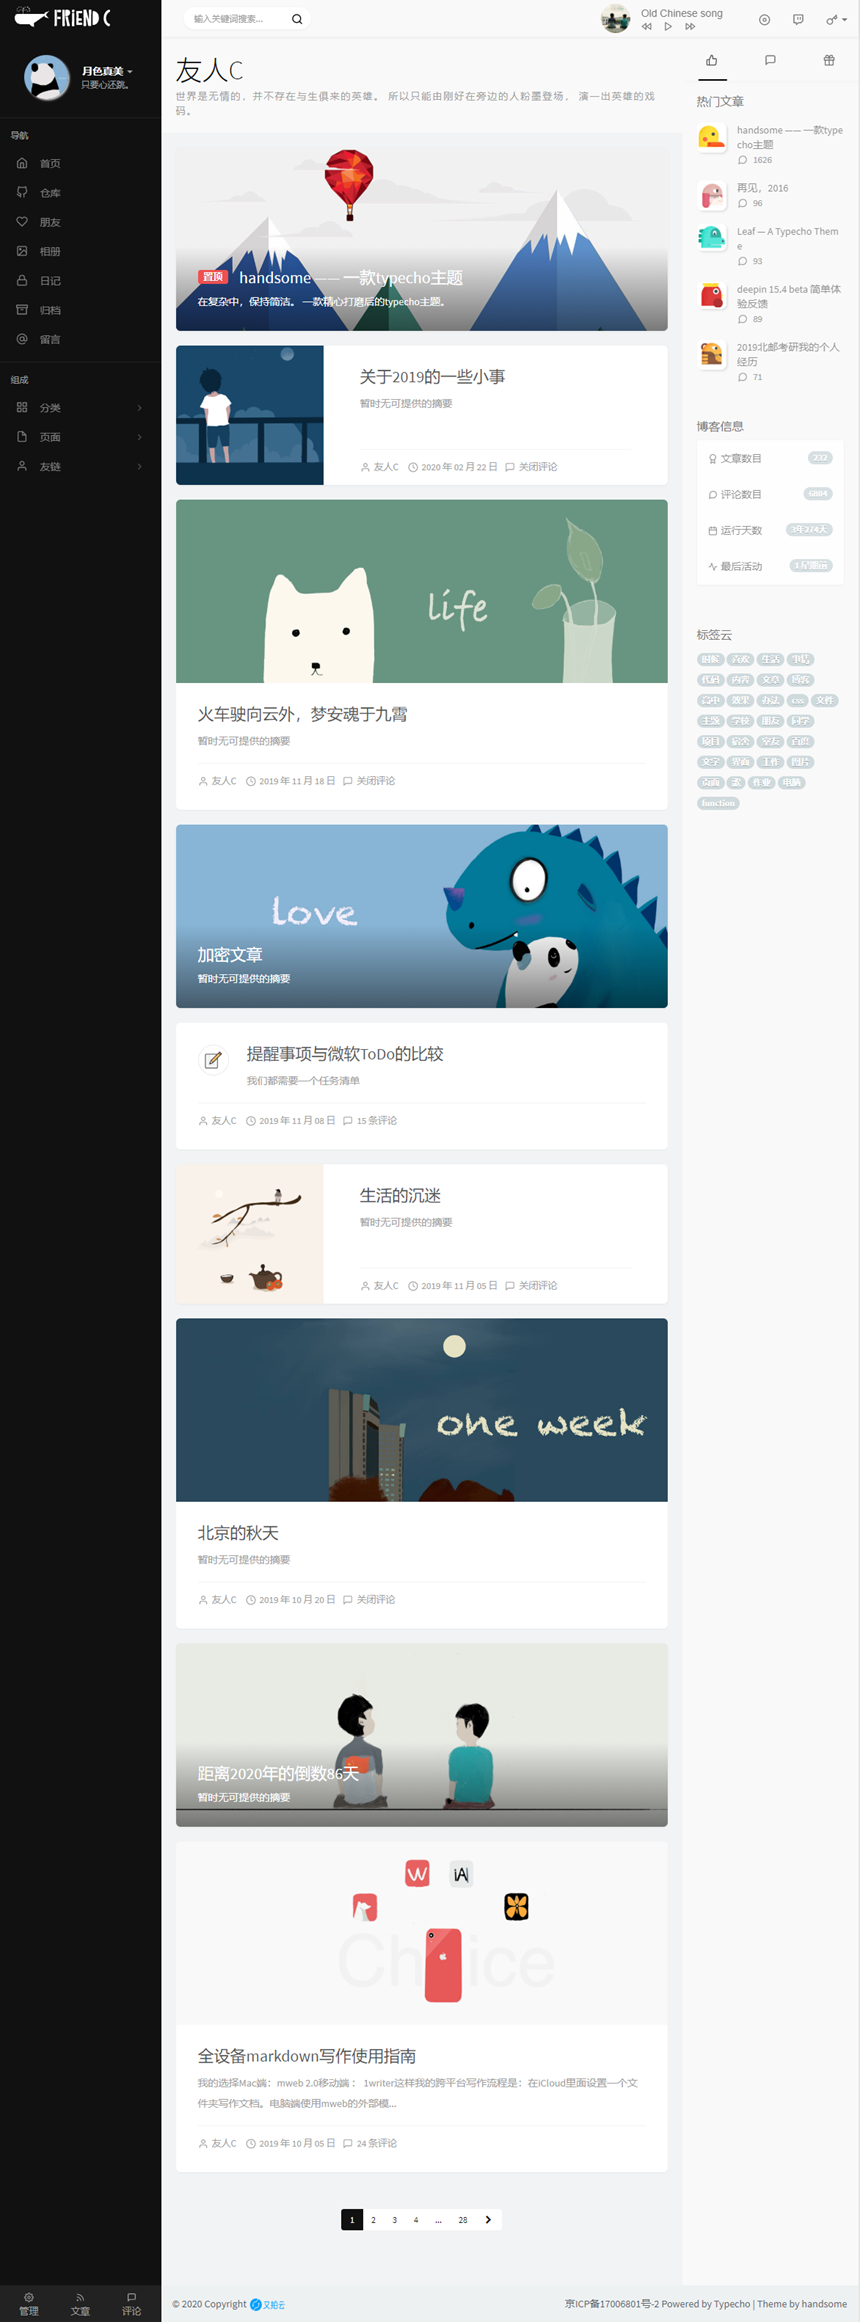 WordPress模板 简洁handsome6.0主题去授权开心版